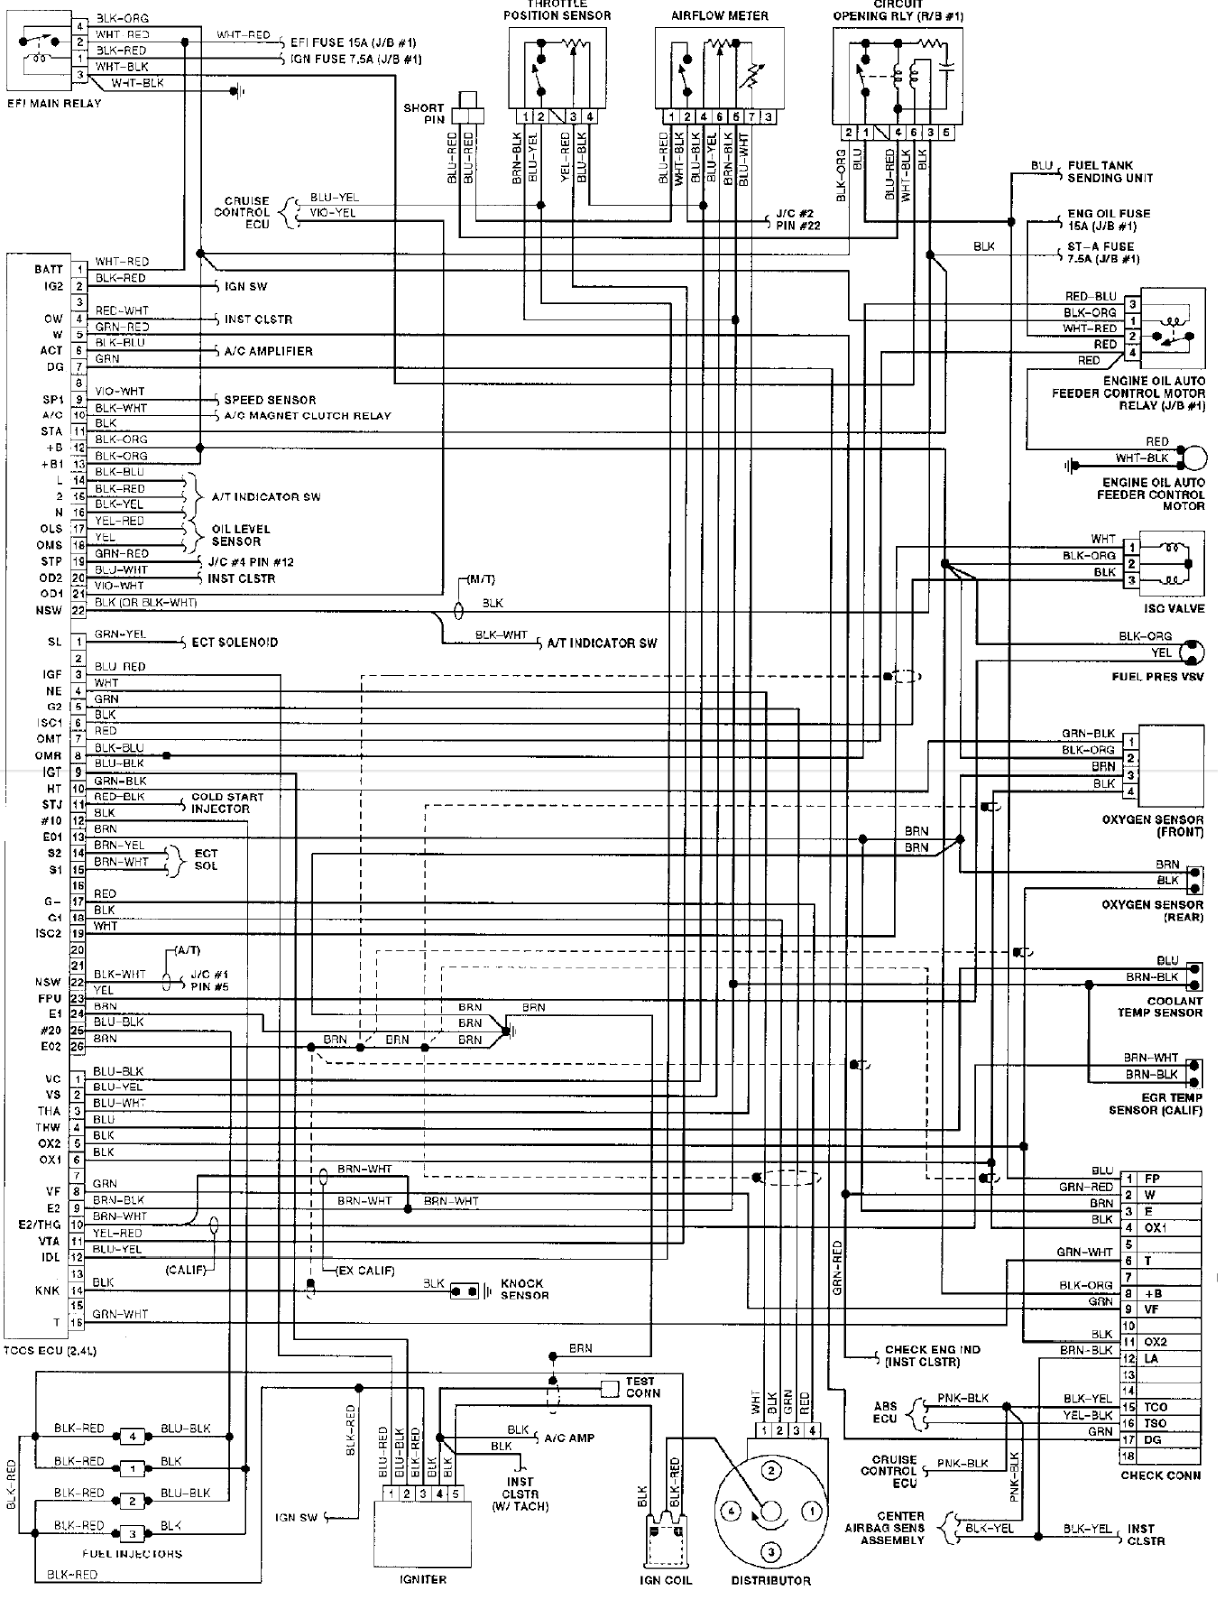 small resolution of wiring diagram for gear vendors overdrive 67 nova dash gear vendors electronics gear vendors oil